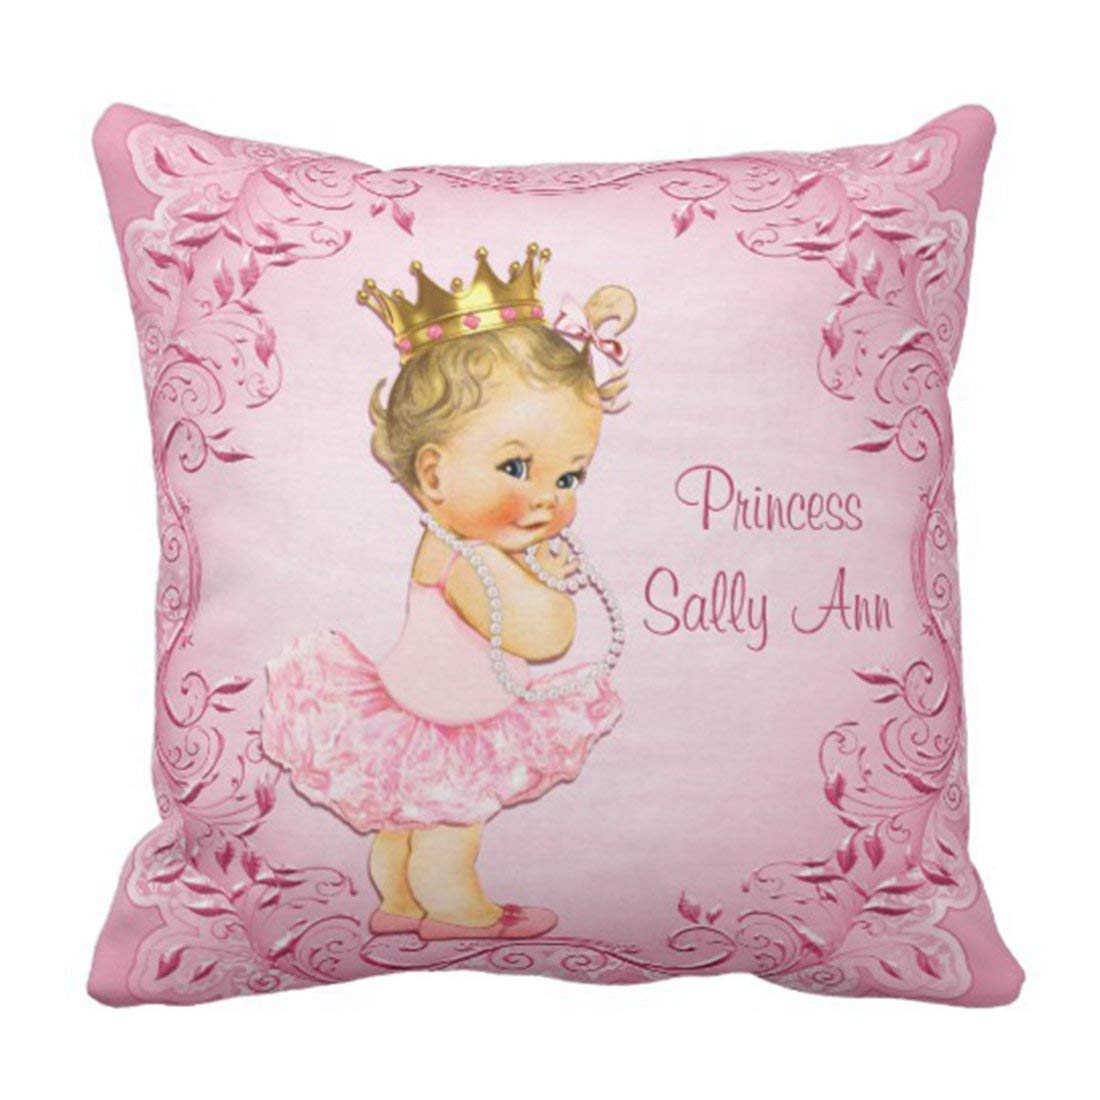 WOPOP Cute Baby Princess Ballerina Pink Vintage Girl Pillowcase Cushion Cover 16x16 inches